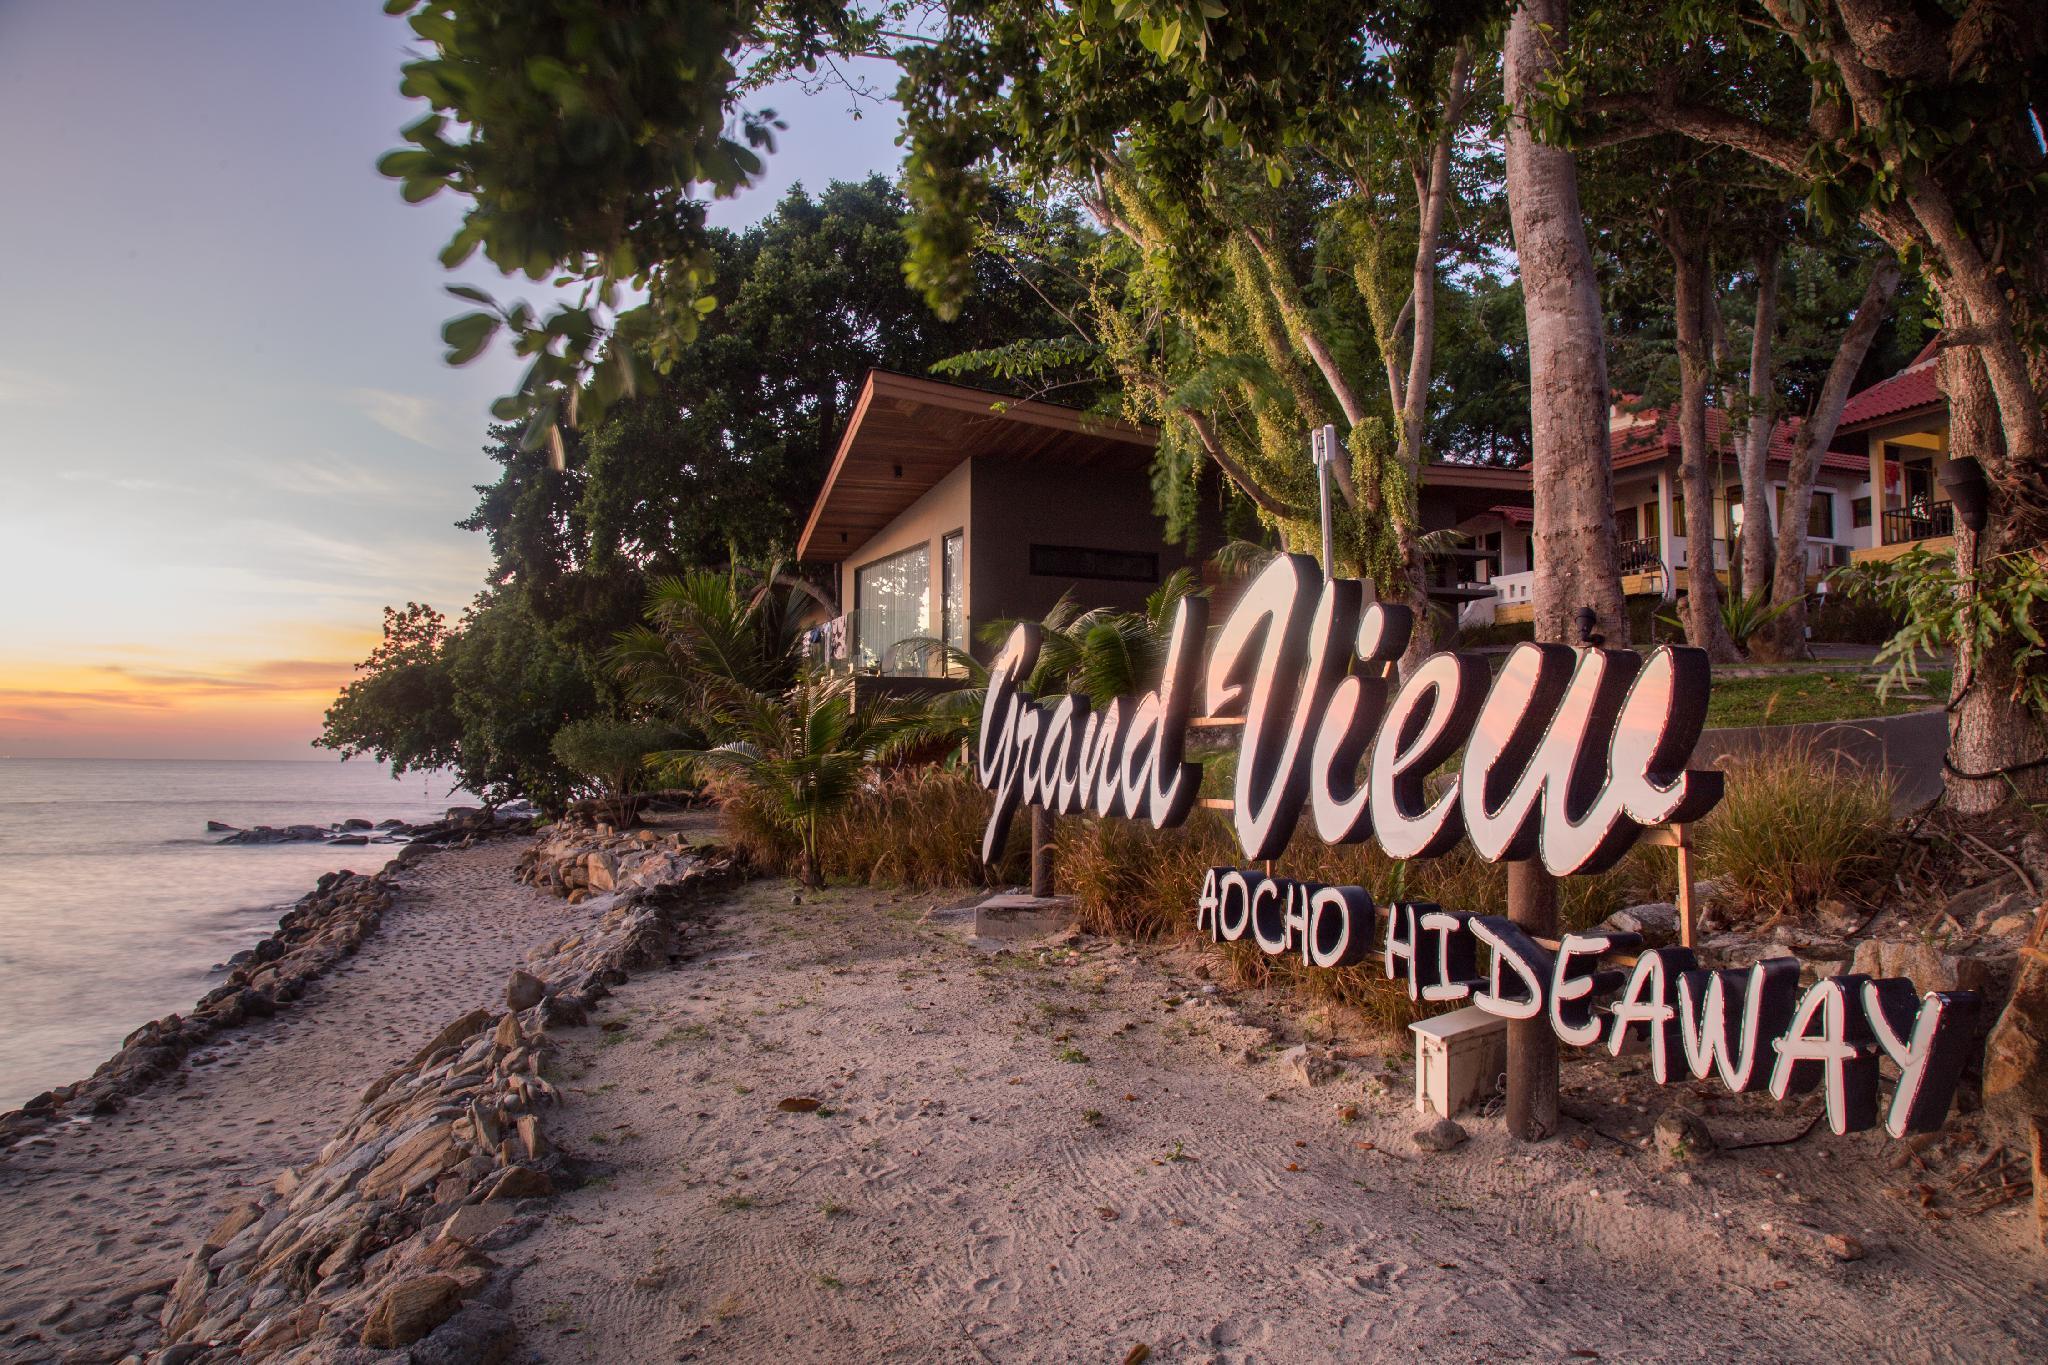 Ao Cho Grandview Hideaway Resort อ่าวช่อ แกรนด์วิว ไฮด์อะเวย์ รีสอร์ท